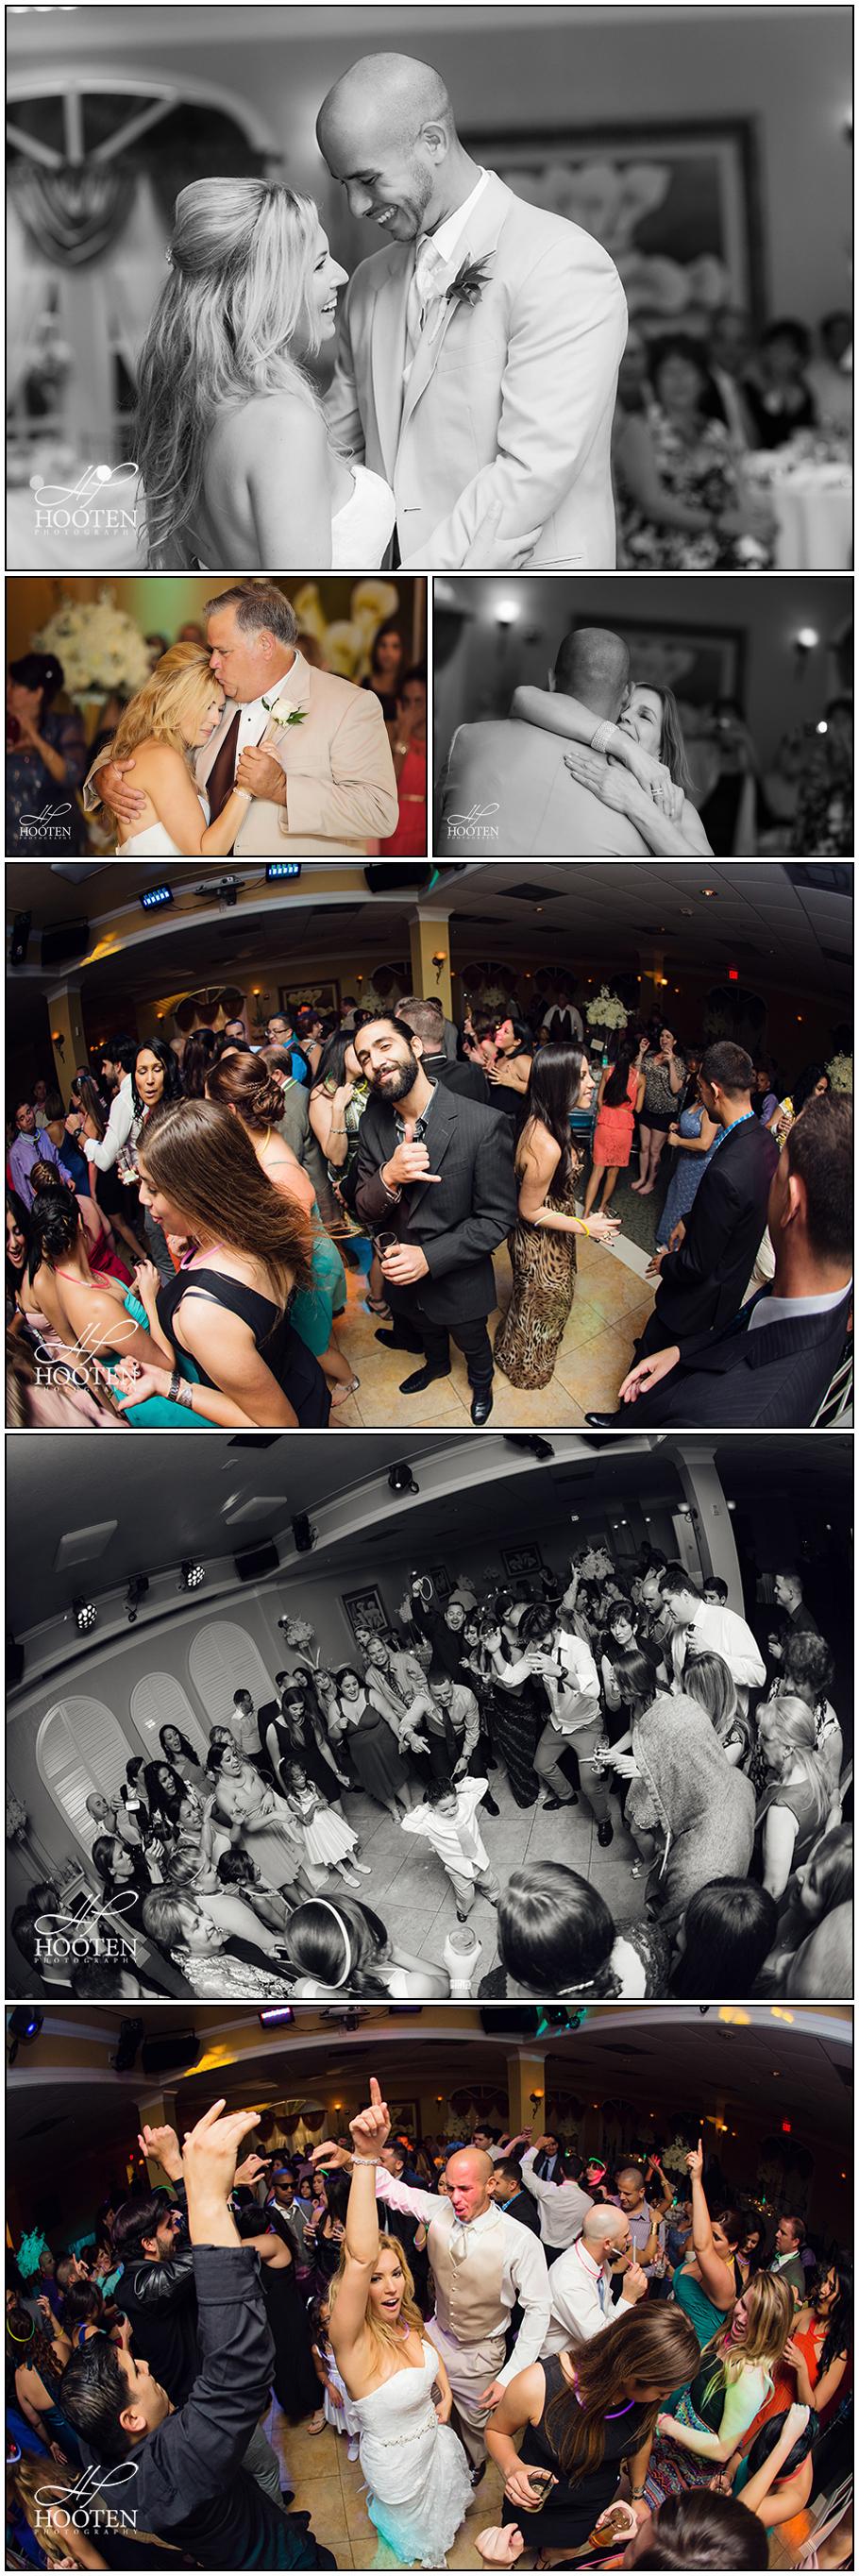 Hooten-Photography-Miami-Wedding-Photography-Rodriguez-Photo-7.jpg